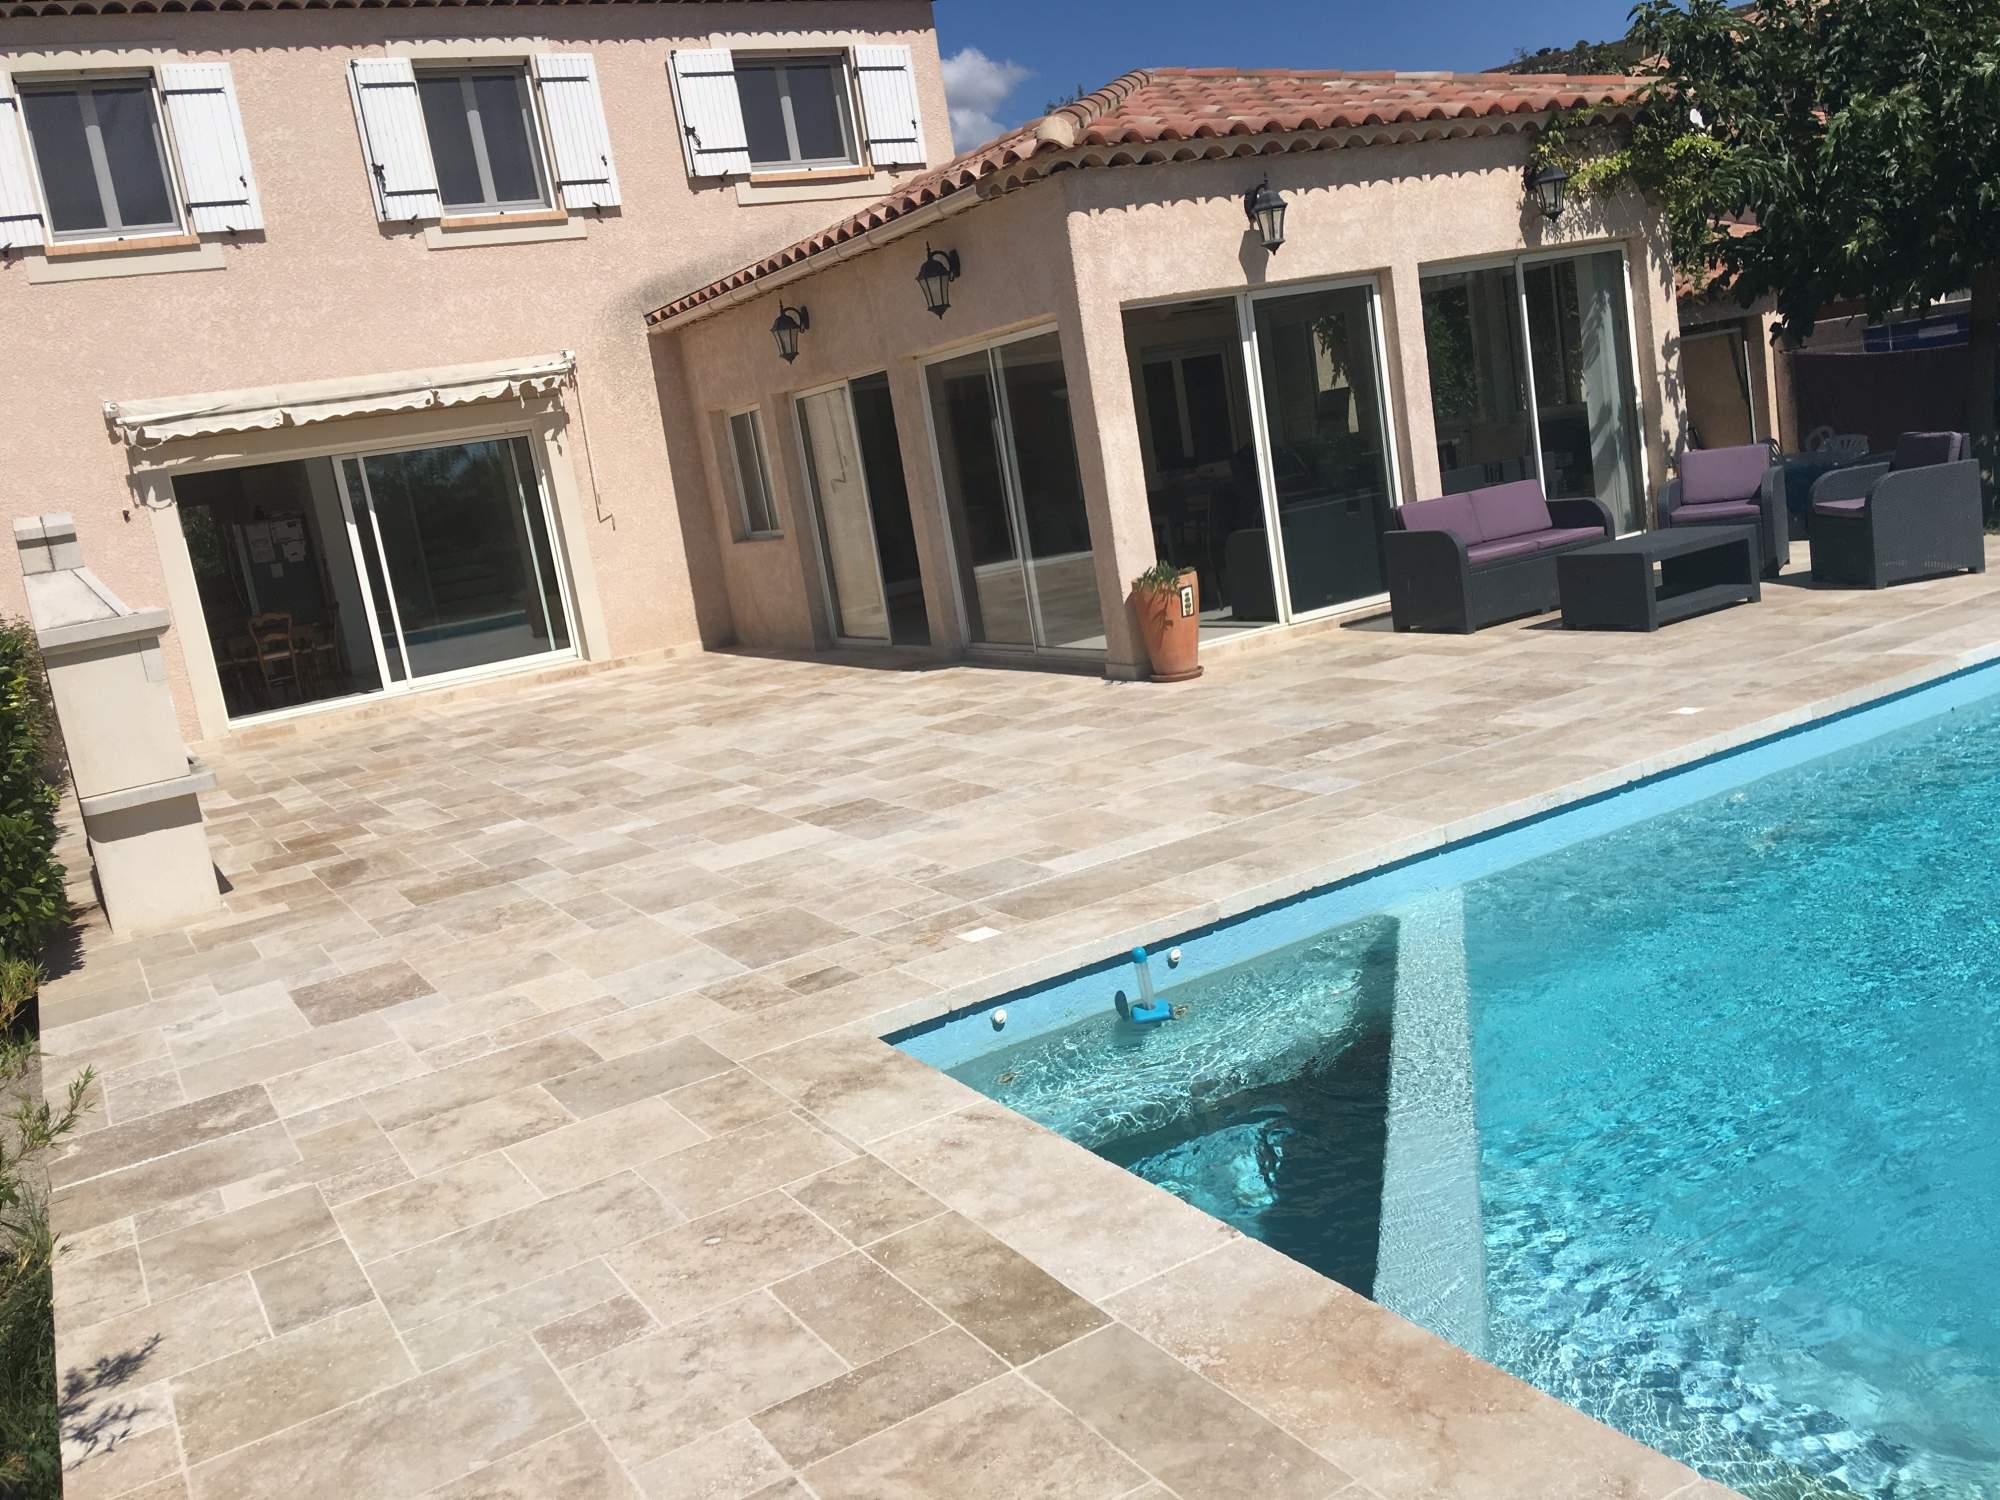 Terrasse de piscine en travertin terrasse en contour de piscine en opus de travertin bouche du for Piscine en travertin